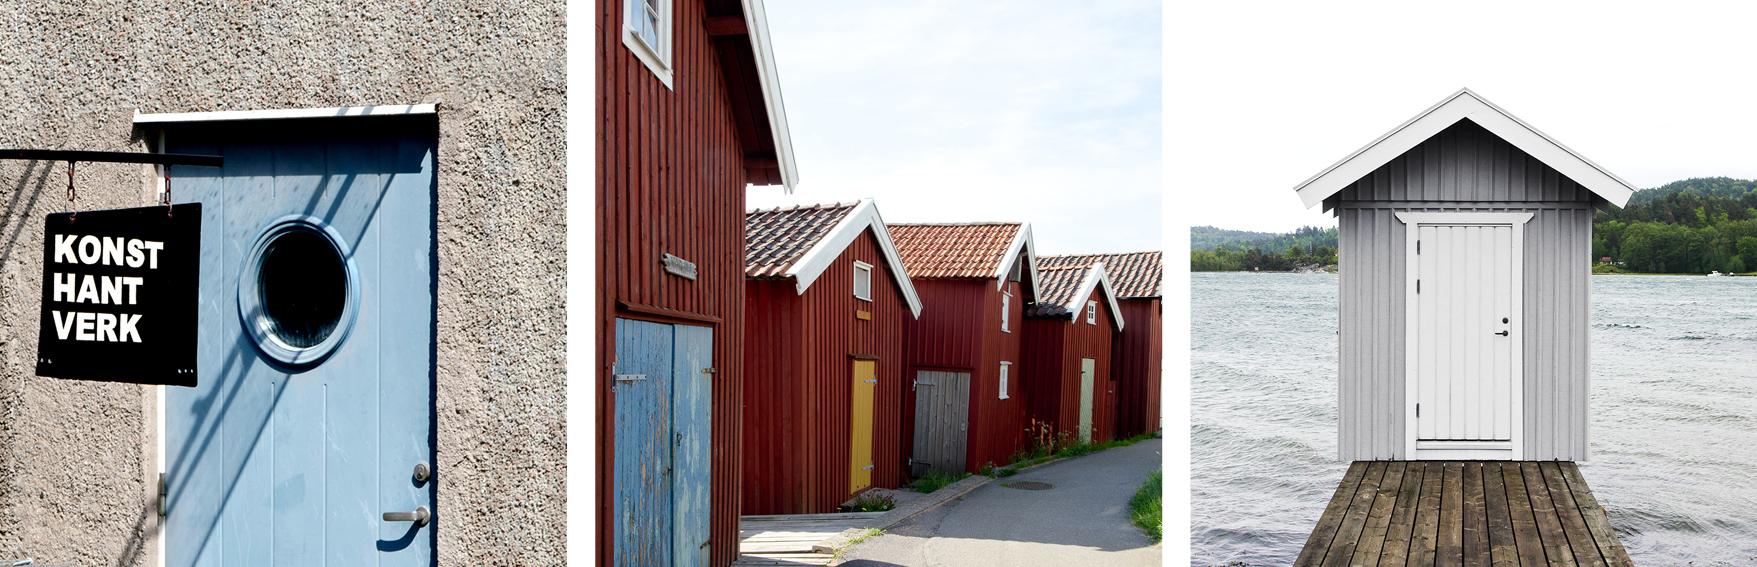 Sweden II – Roman Pretot, Serien-Nr.: 361-031